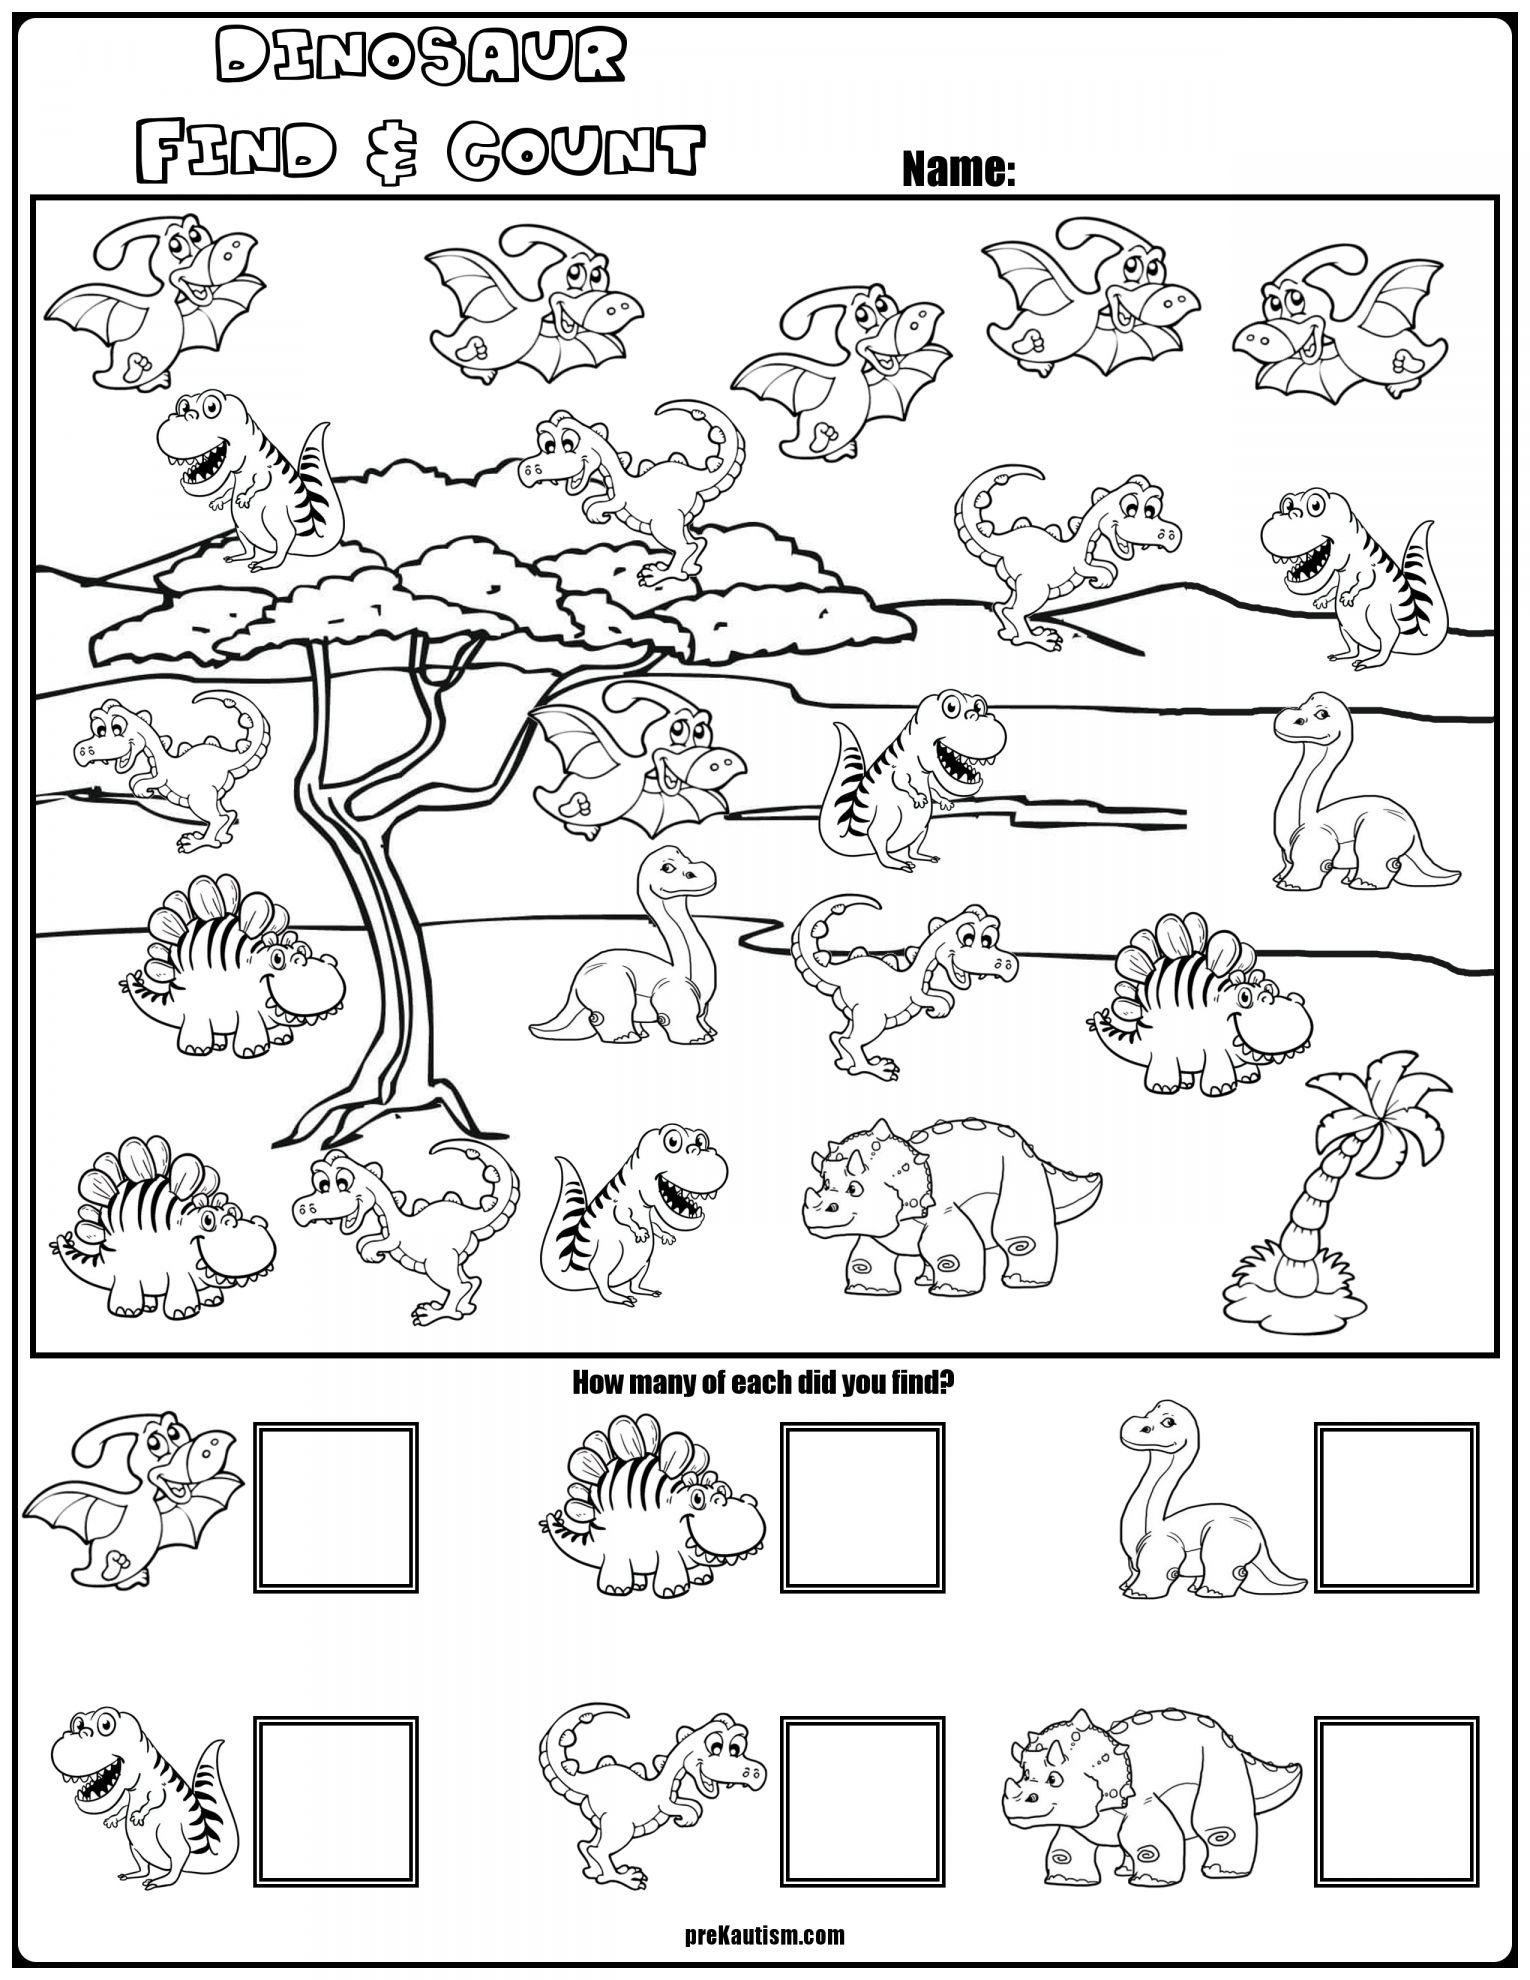 Dinosaurs Worksheet Kindergarten And Find Amp Count Dinosaur